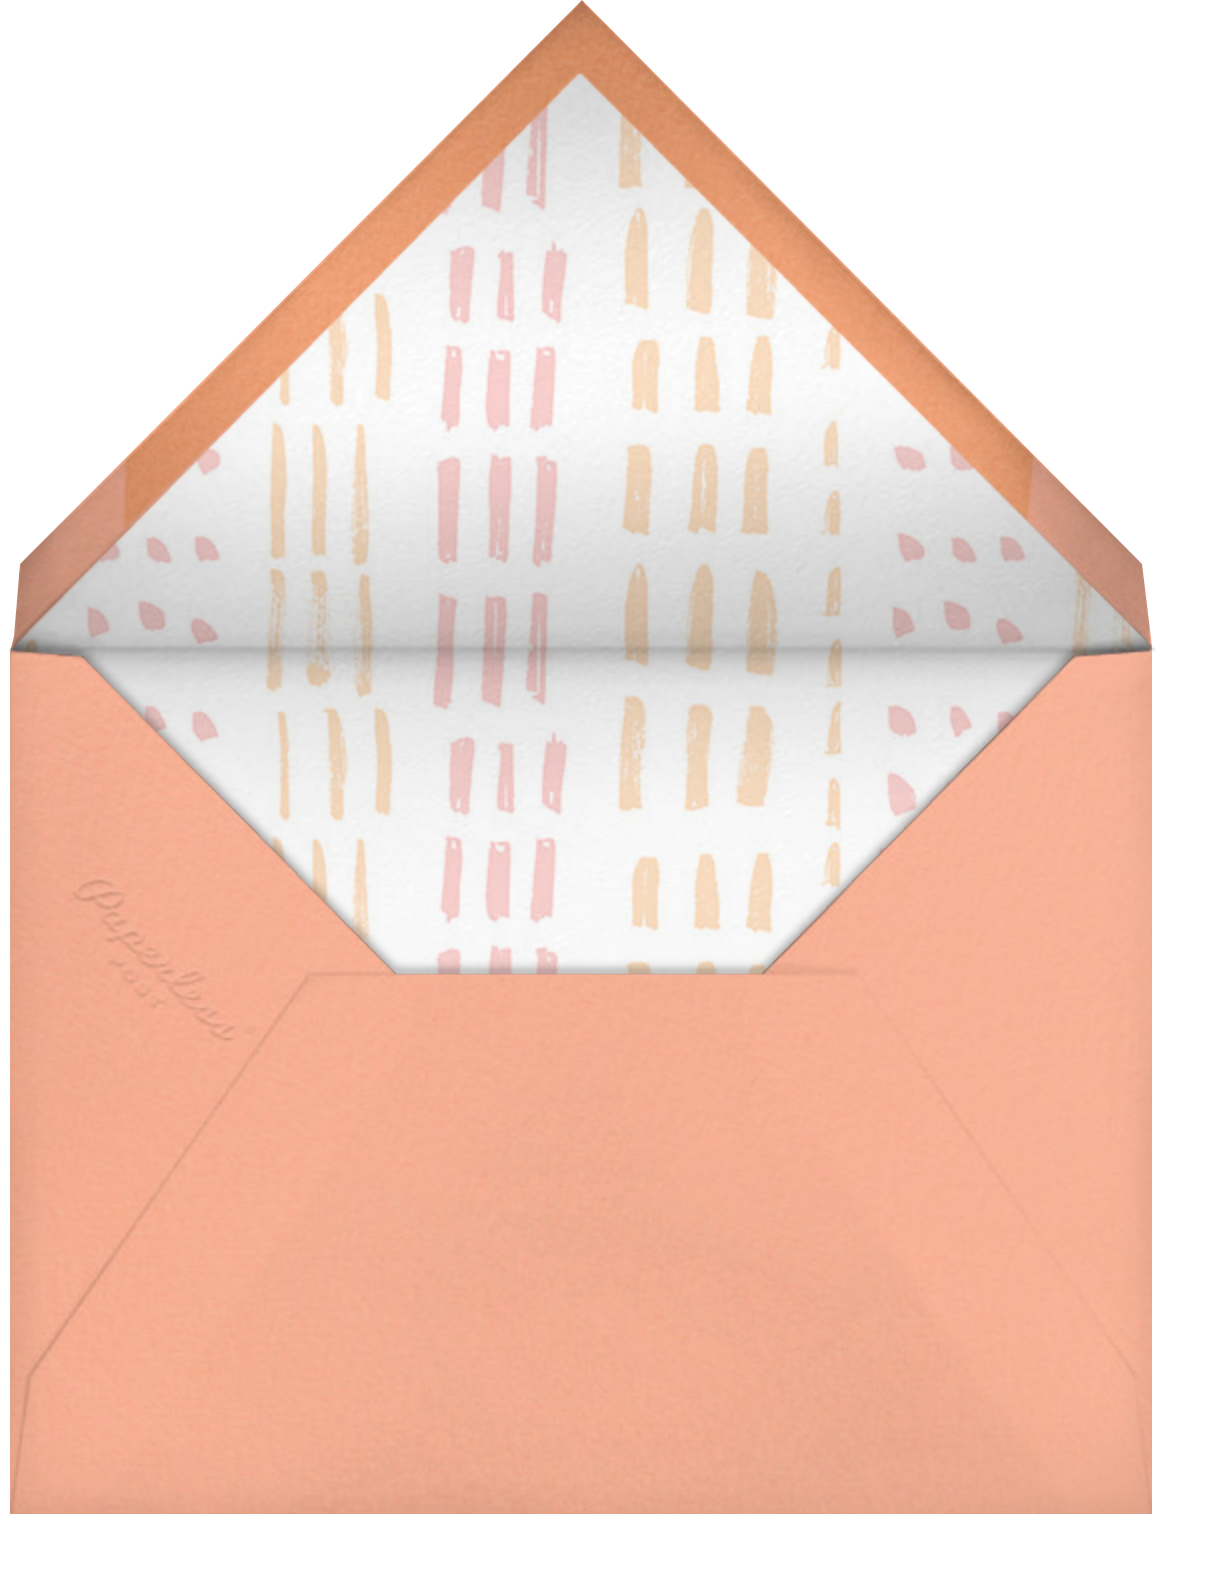 White (Tall) - Paperless Post - Woodland baby shower - envelope back